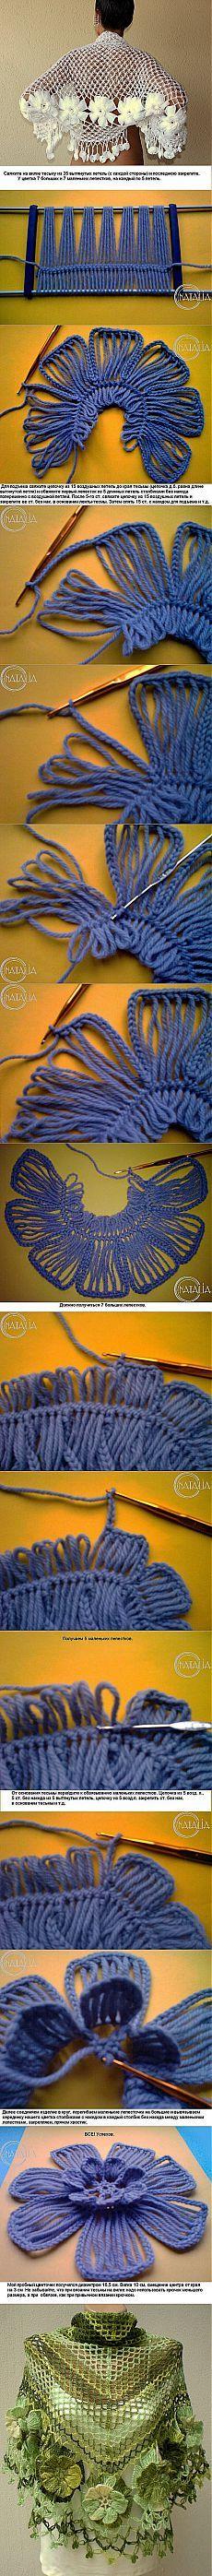 crochet flower tutorial=DIY Basic Flower with Crochet Fork and Hook Hairpin Lace Crochet, Crochet Motif, Crochet Shawl, Crochet Designs, Crochet Stitches, Knit Crochet, Crochet Patterns, Broomstick Lace, Crochet Flower Tutorial